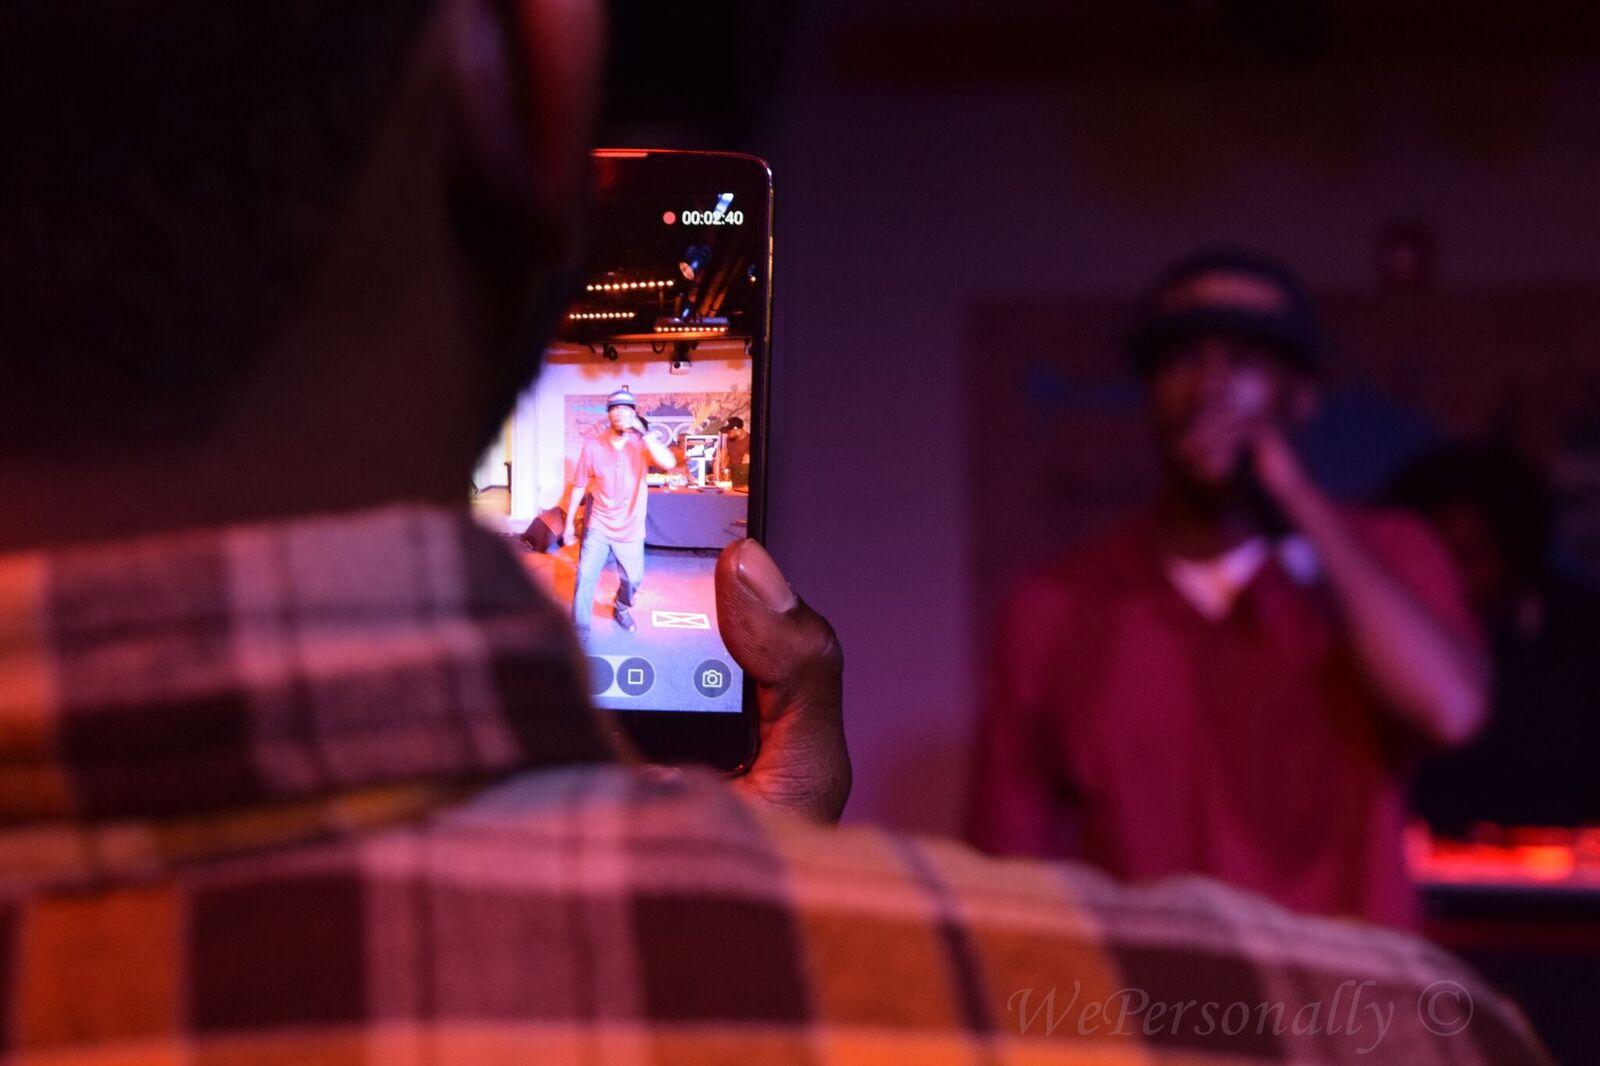 rapper on phone imurj.jpeg